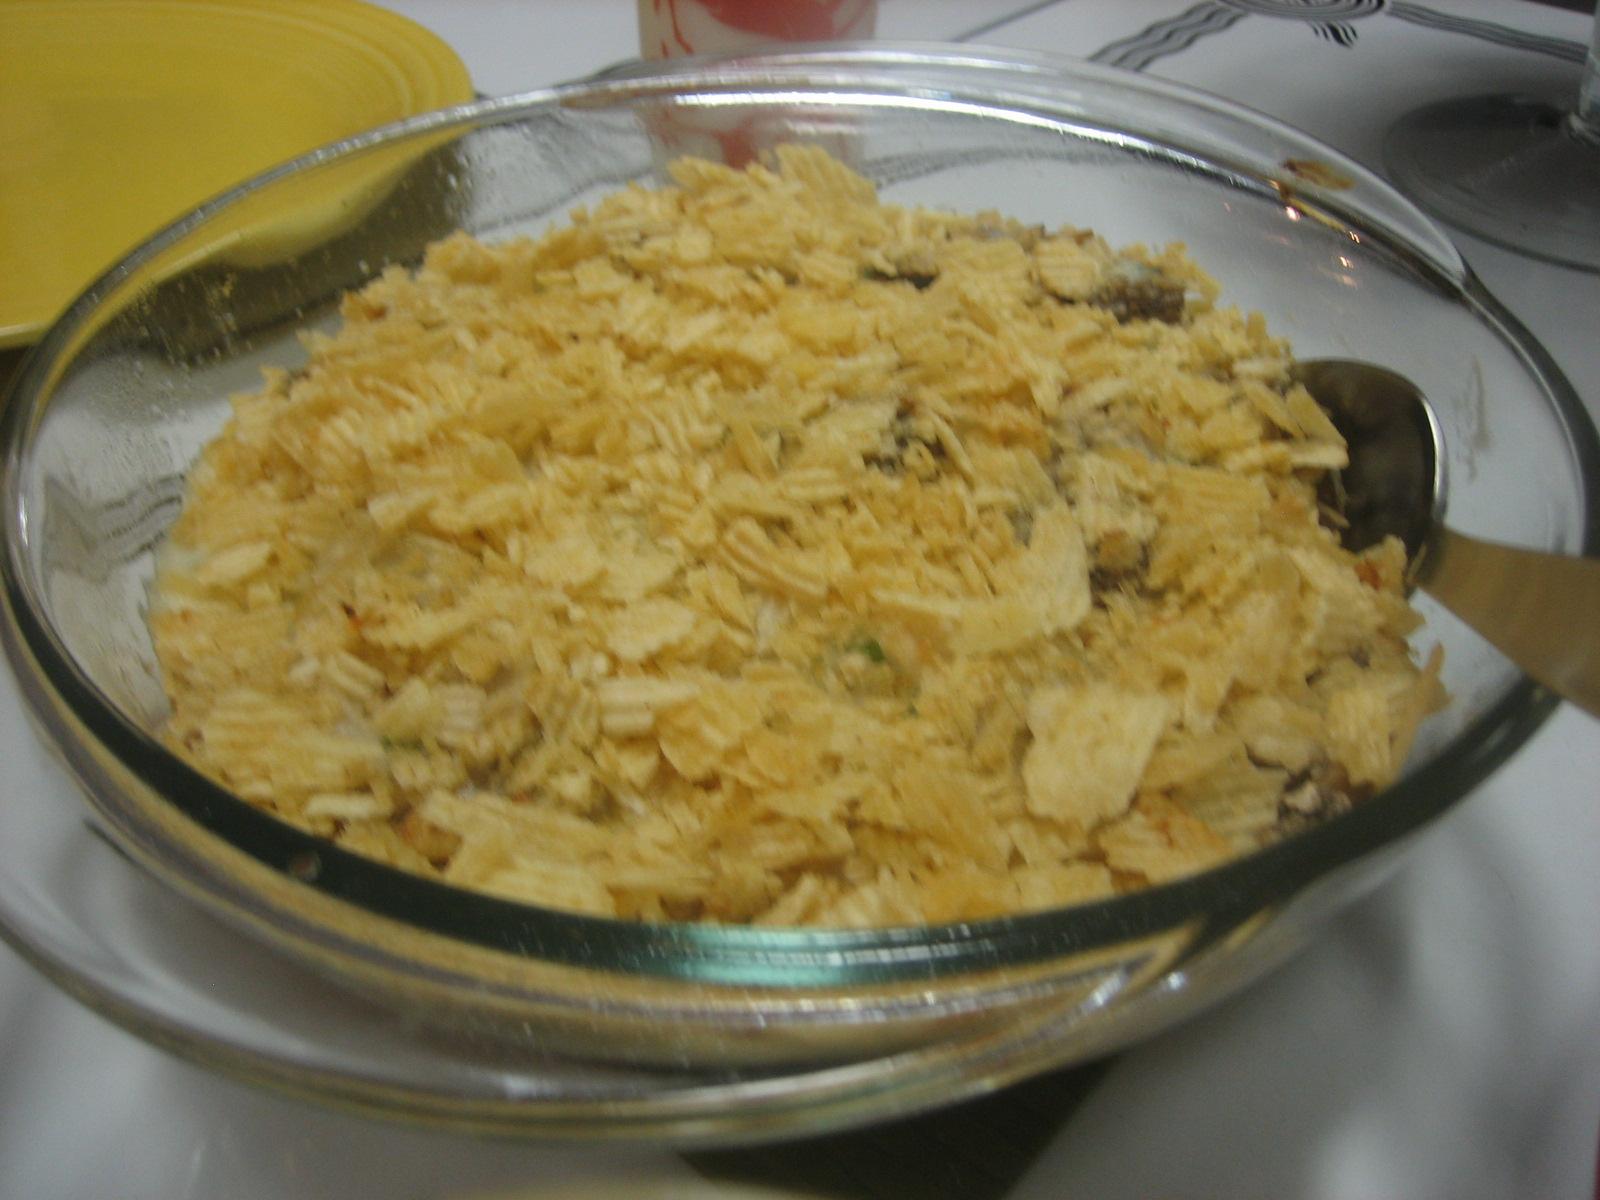 Tuna-Mushroom Scallop